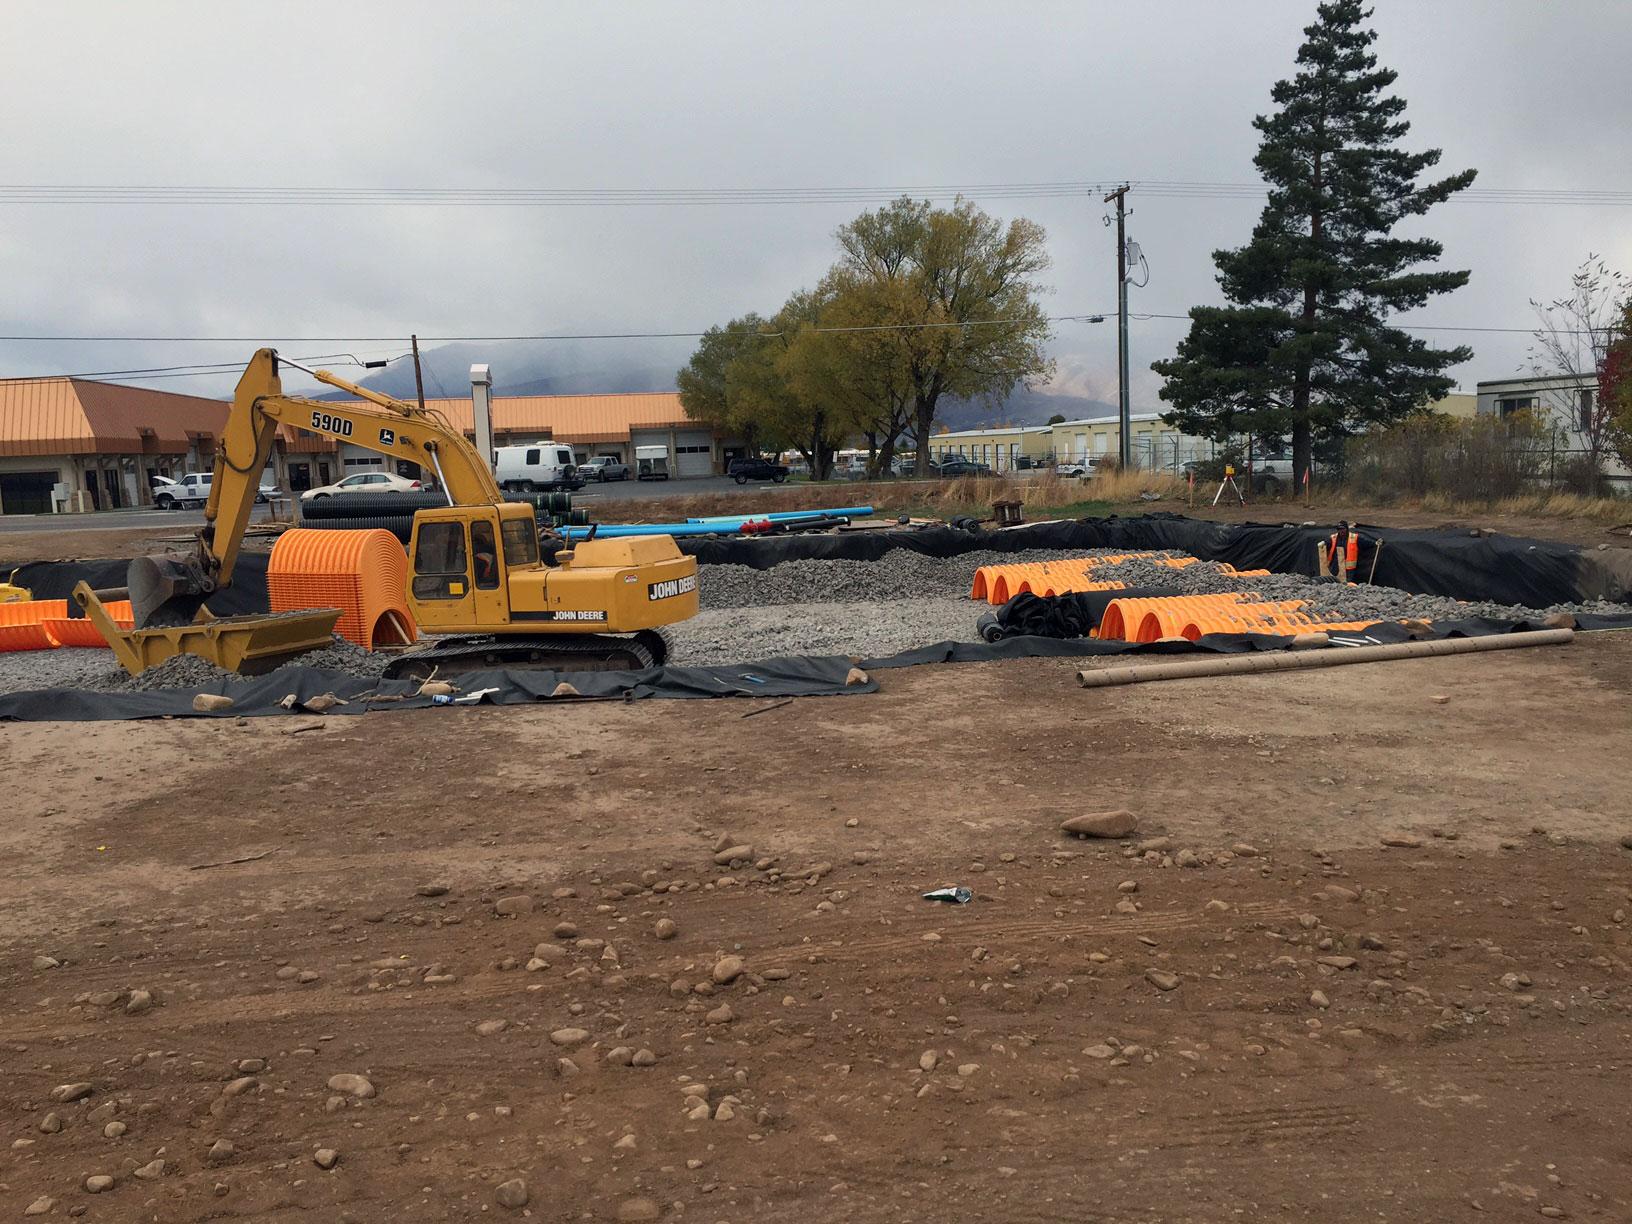 Burton Lumber Heber City Utah Construction 11 6 15 4